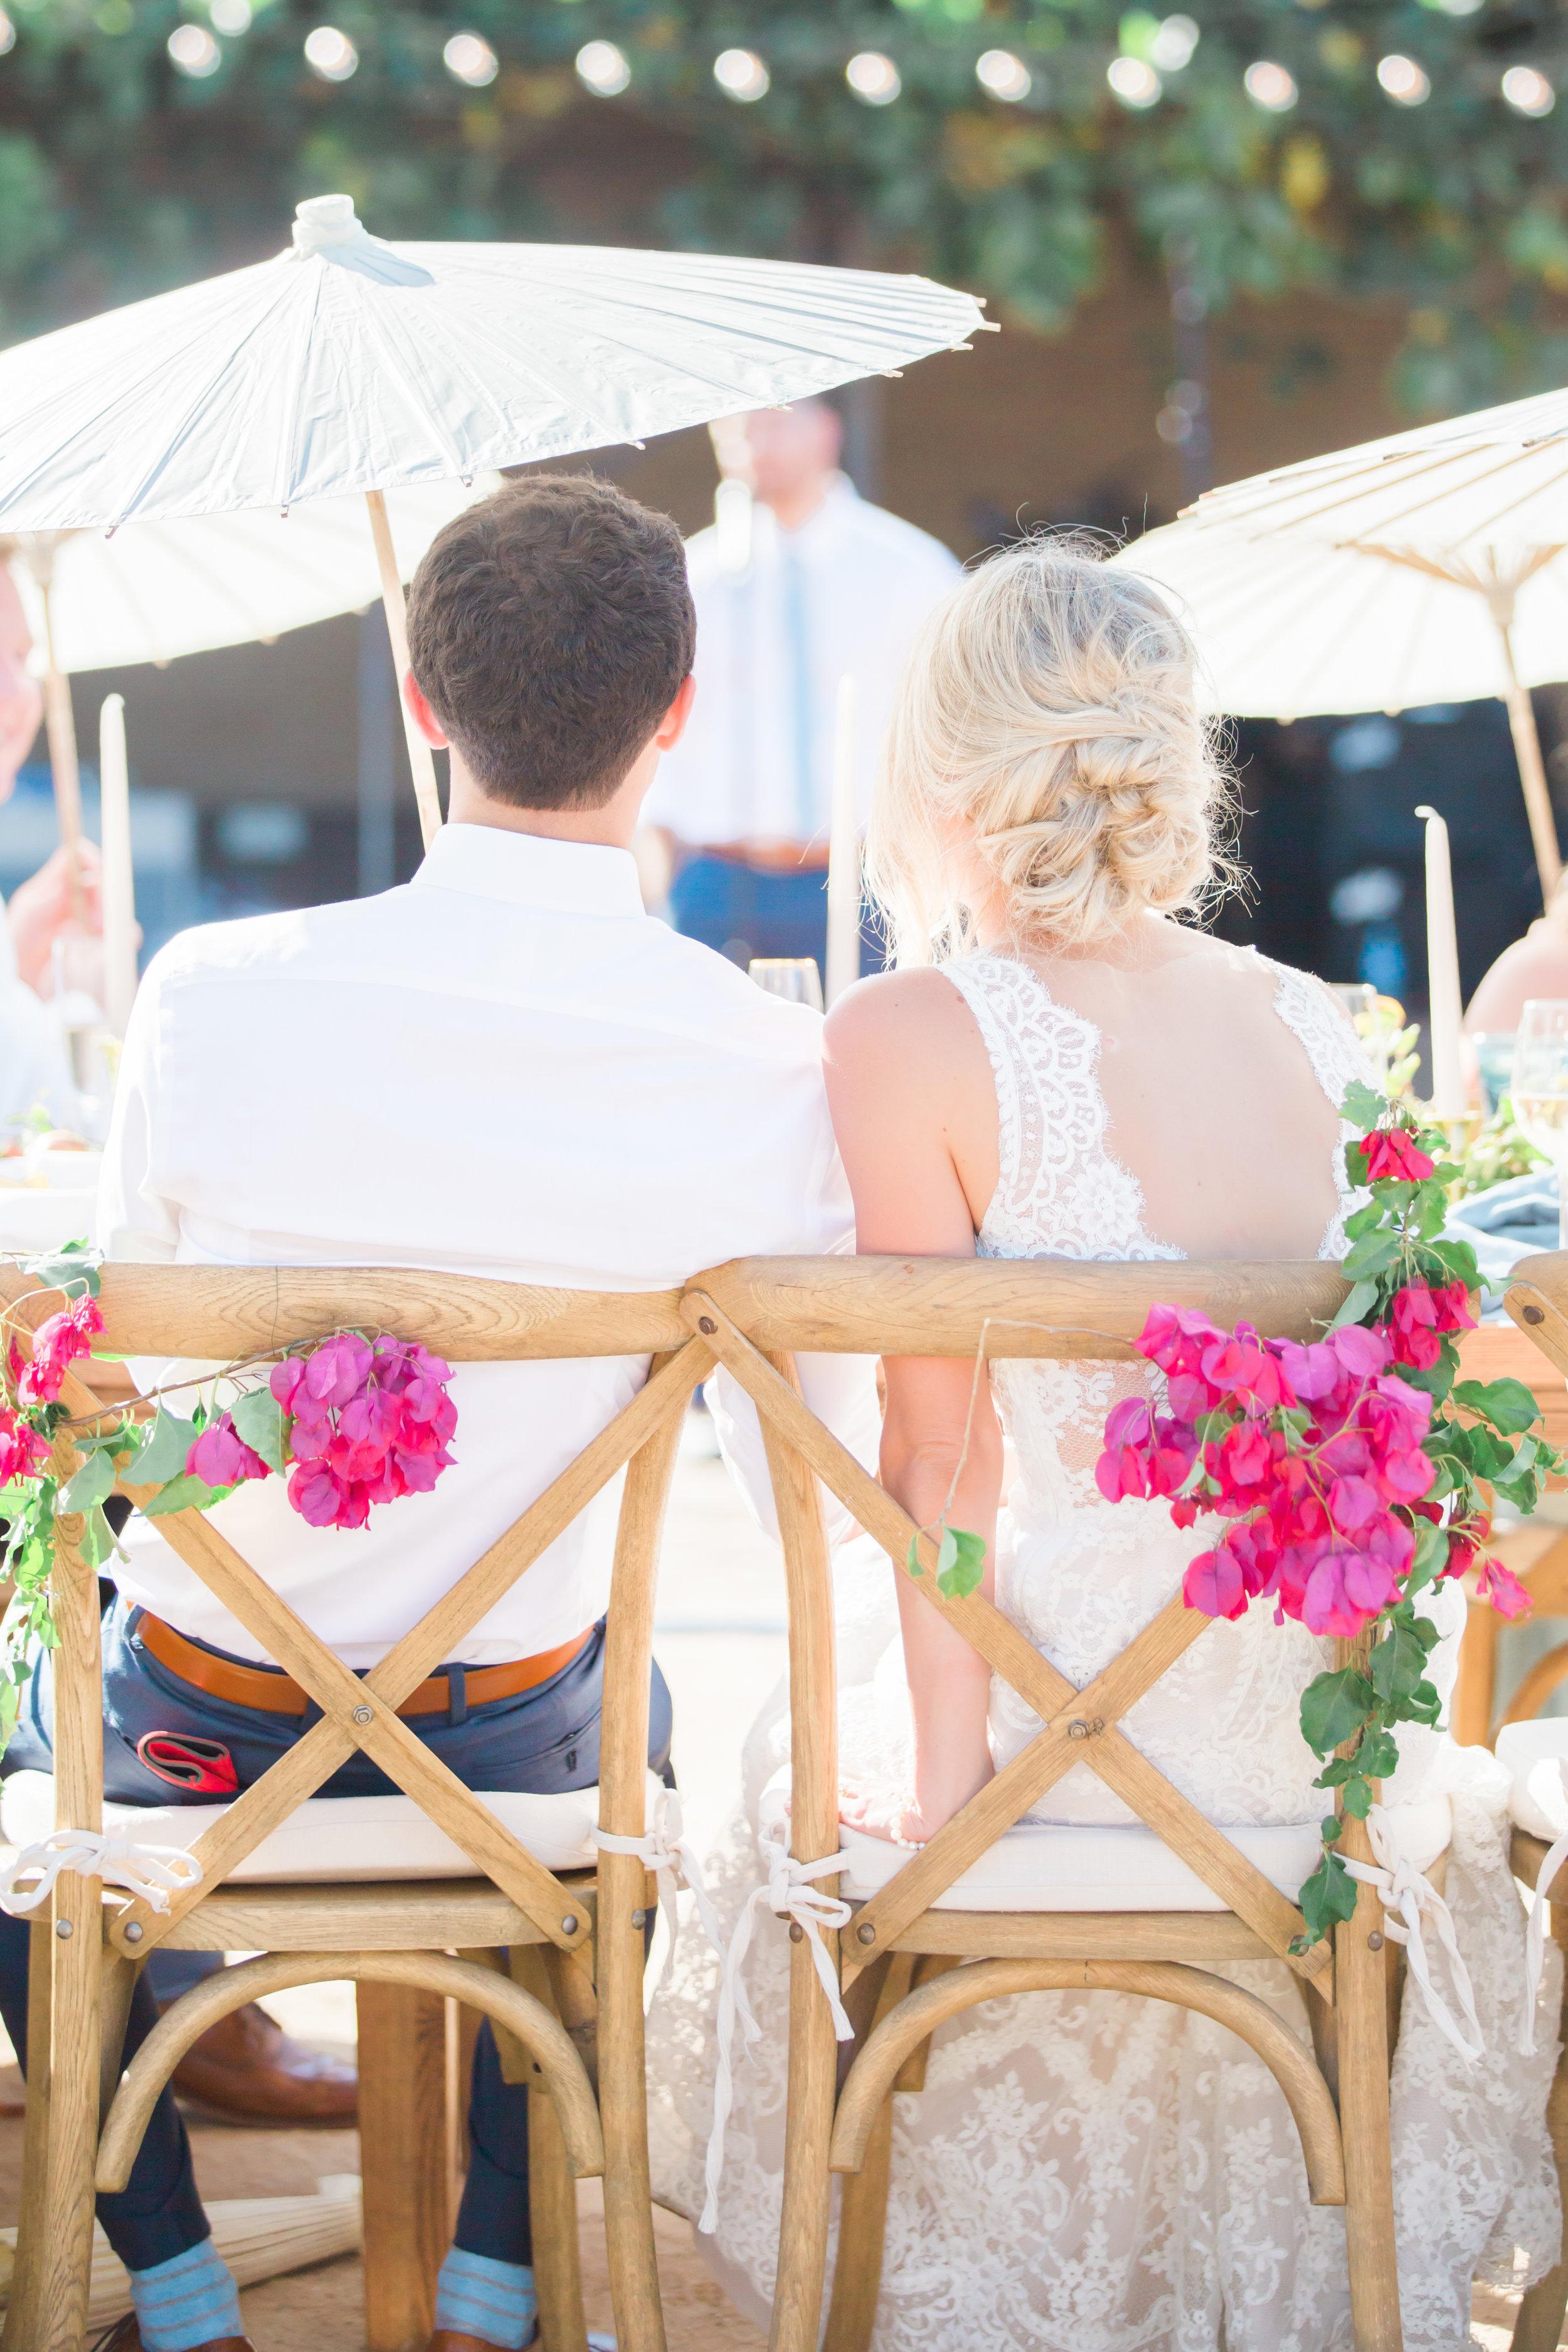 www.santabarbarawedding.com | James and Jess Photography | Santa Barbara Historical | Amazing Day Events | Classic Party Rentals | La Tavola | La Fleur du Jour | Couple at the Reception